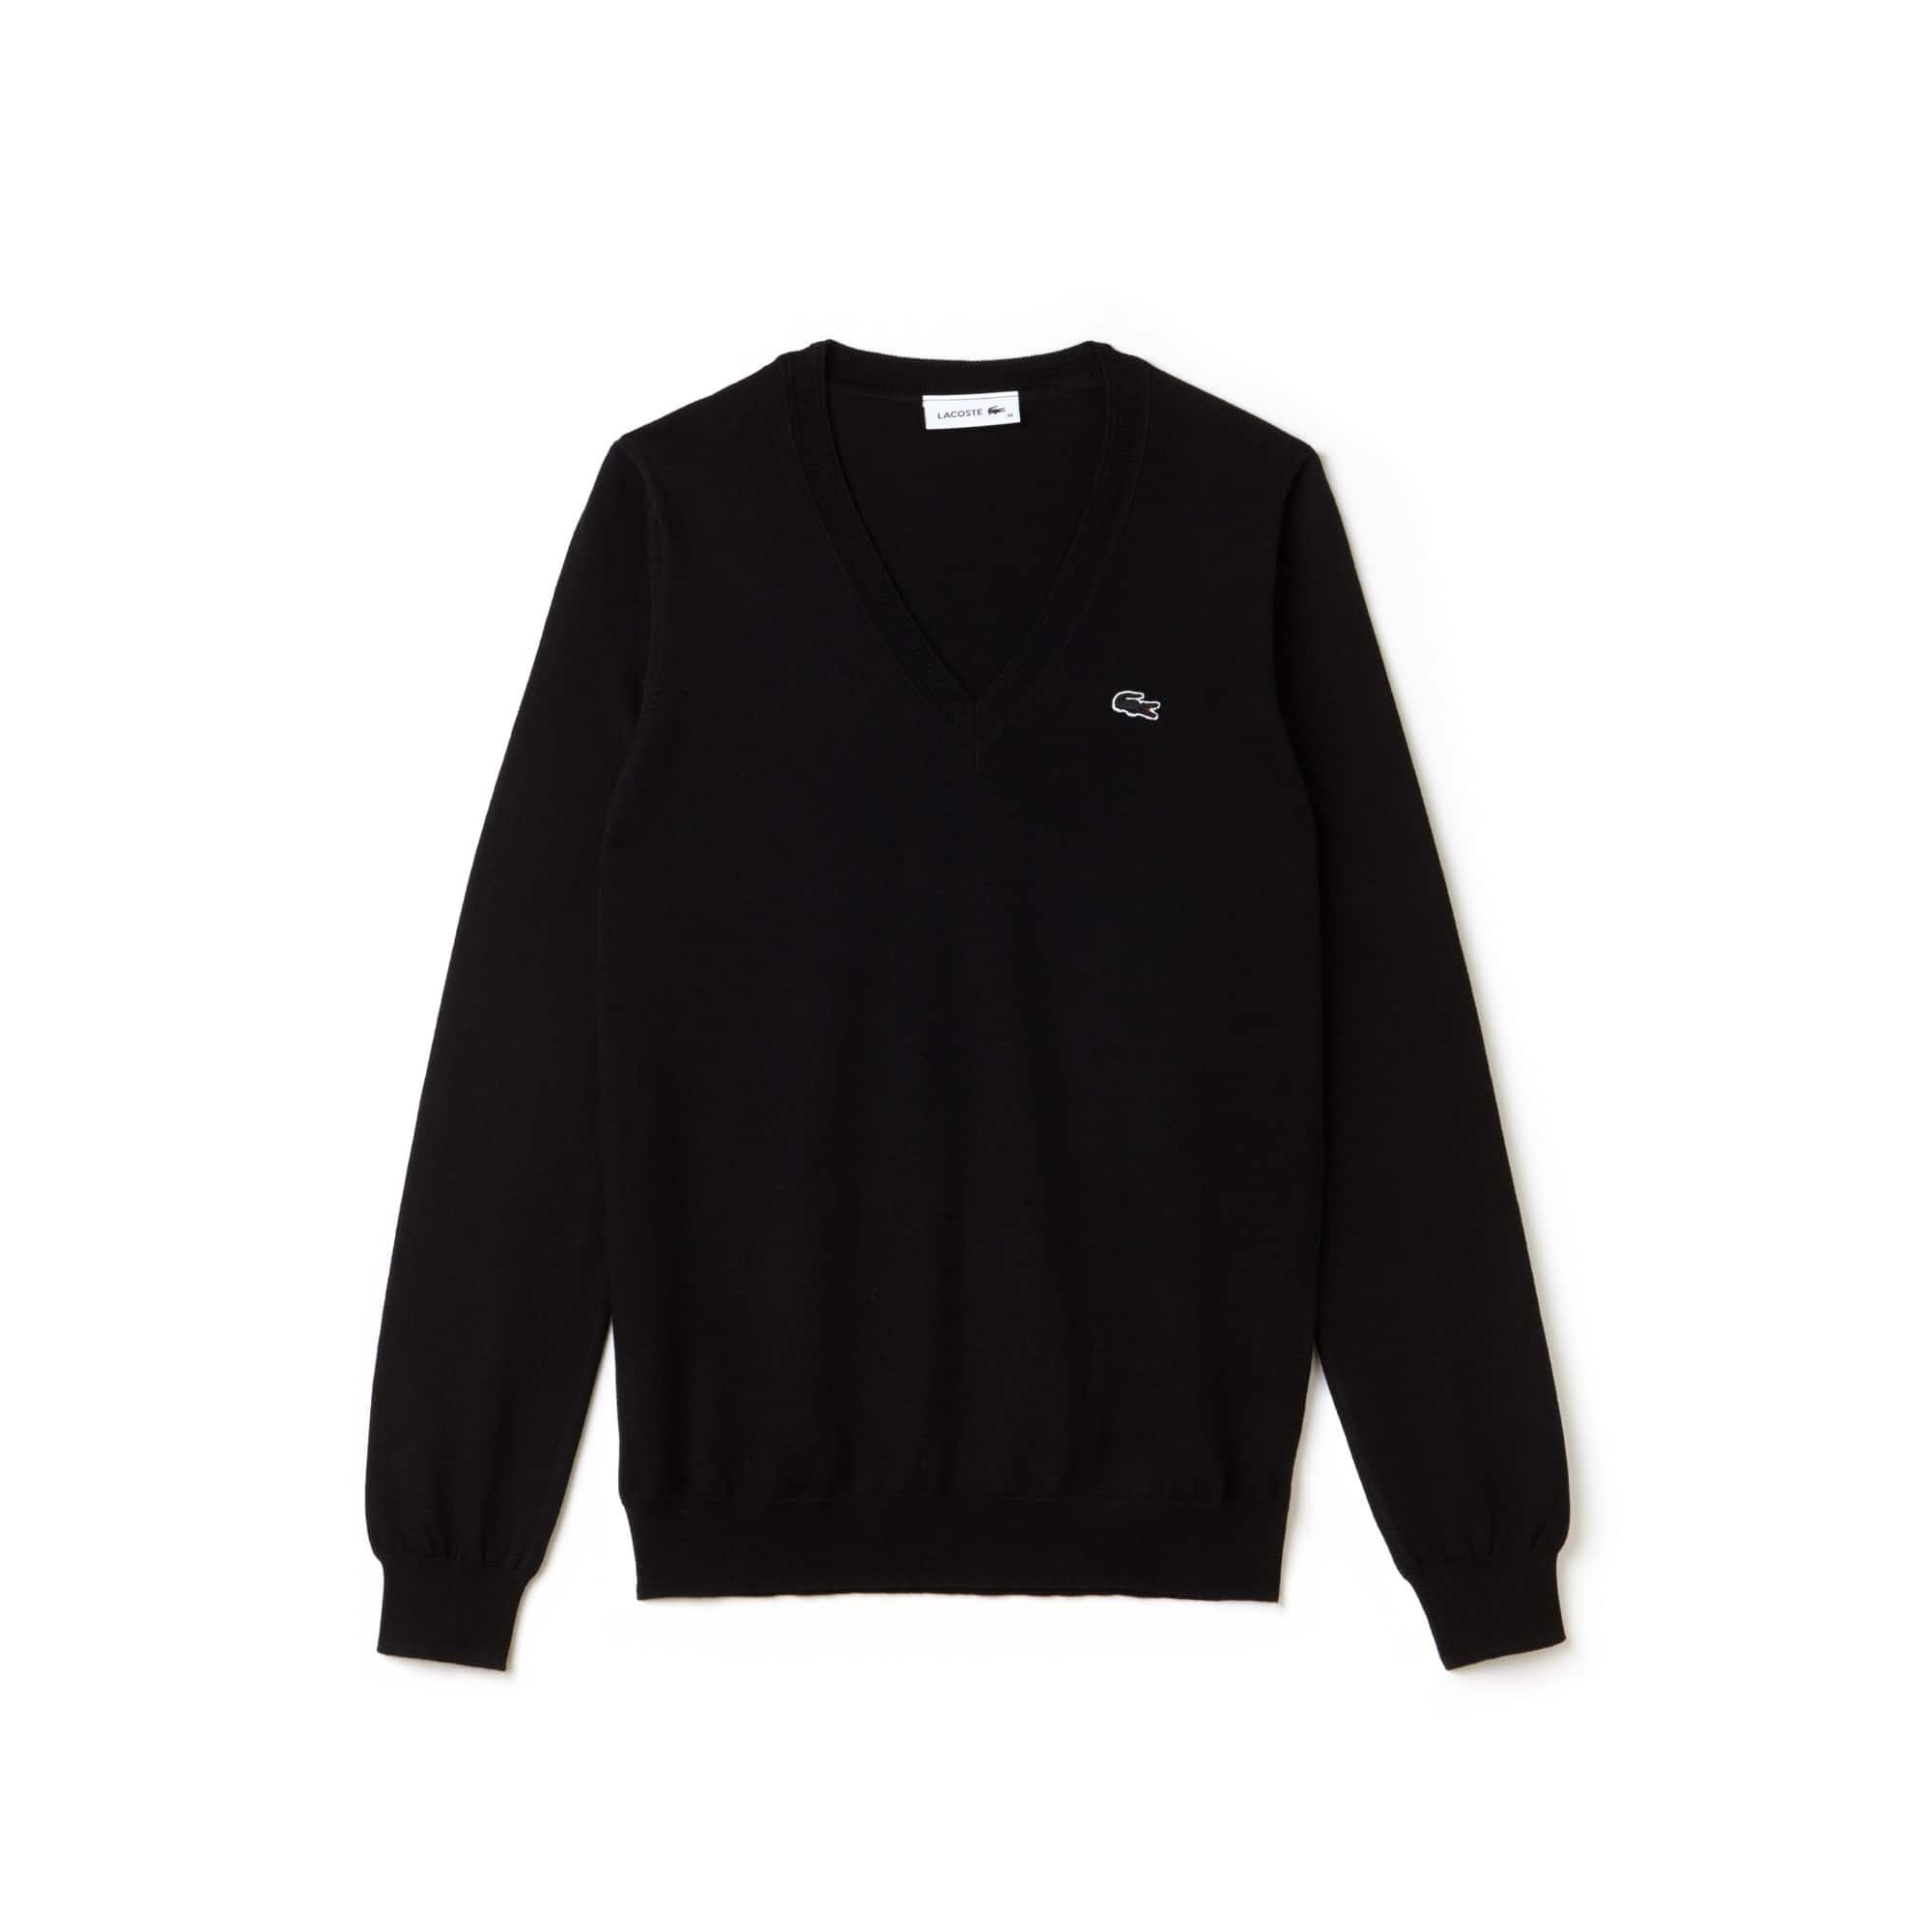 c3298f149 Women s V-neck Jersey Sweater